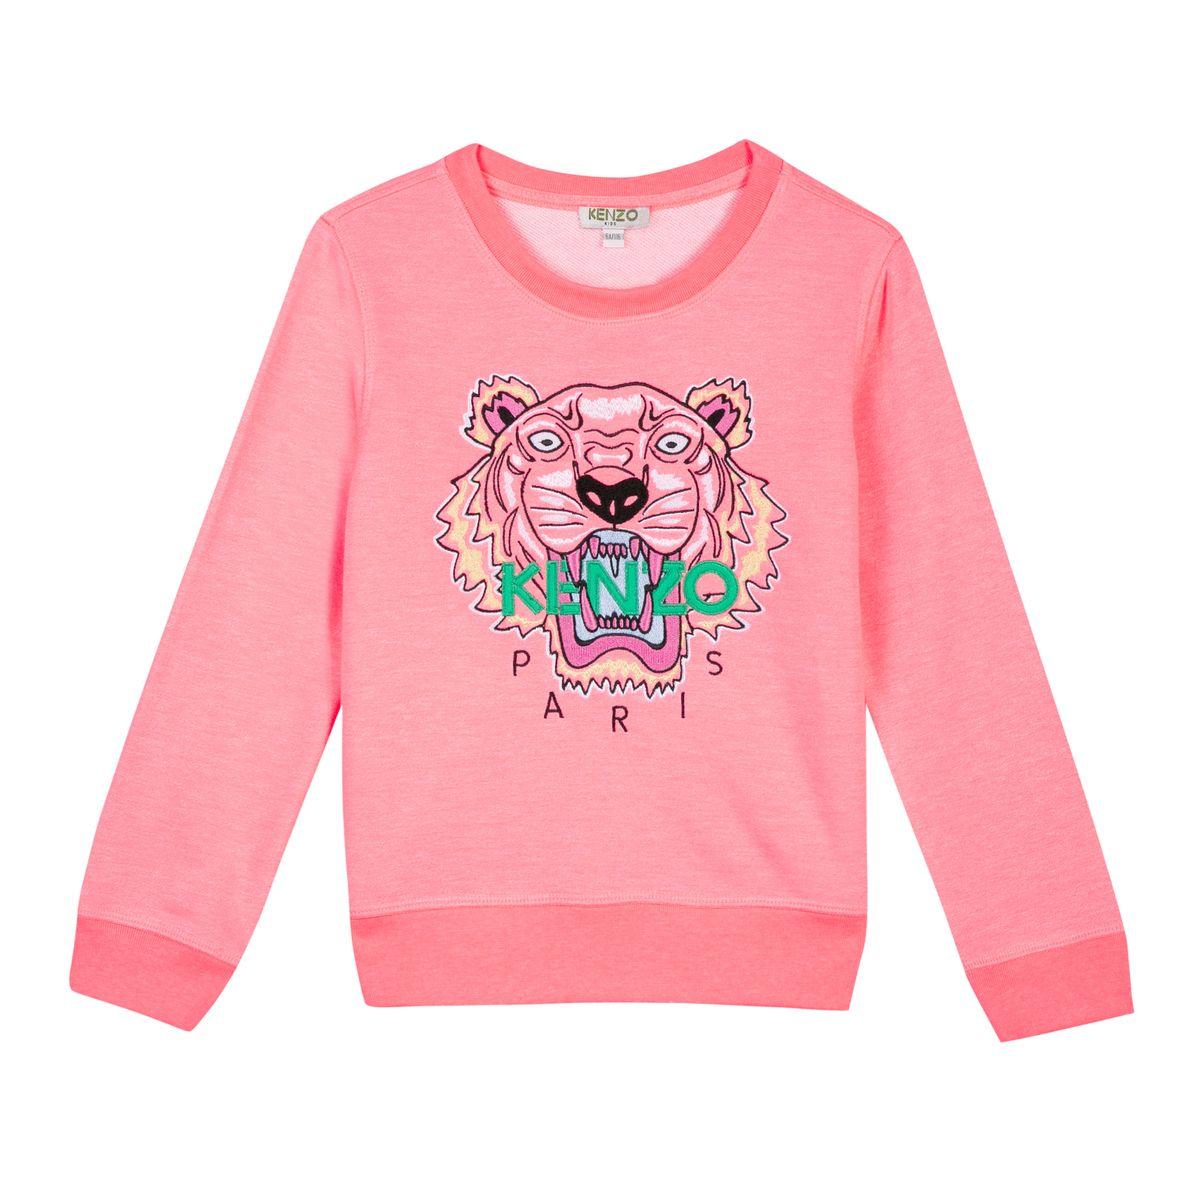 b21e7e41 Kenzo Neon Coral Tiger Sweatshirt KL15038 in 2019   KIDS   Kenzo ...